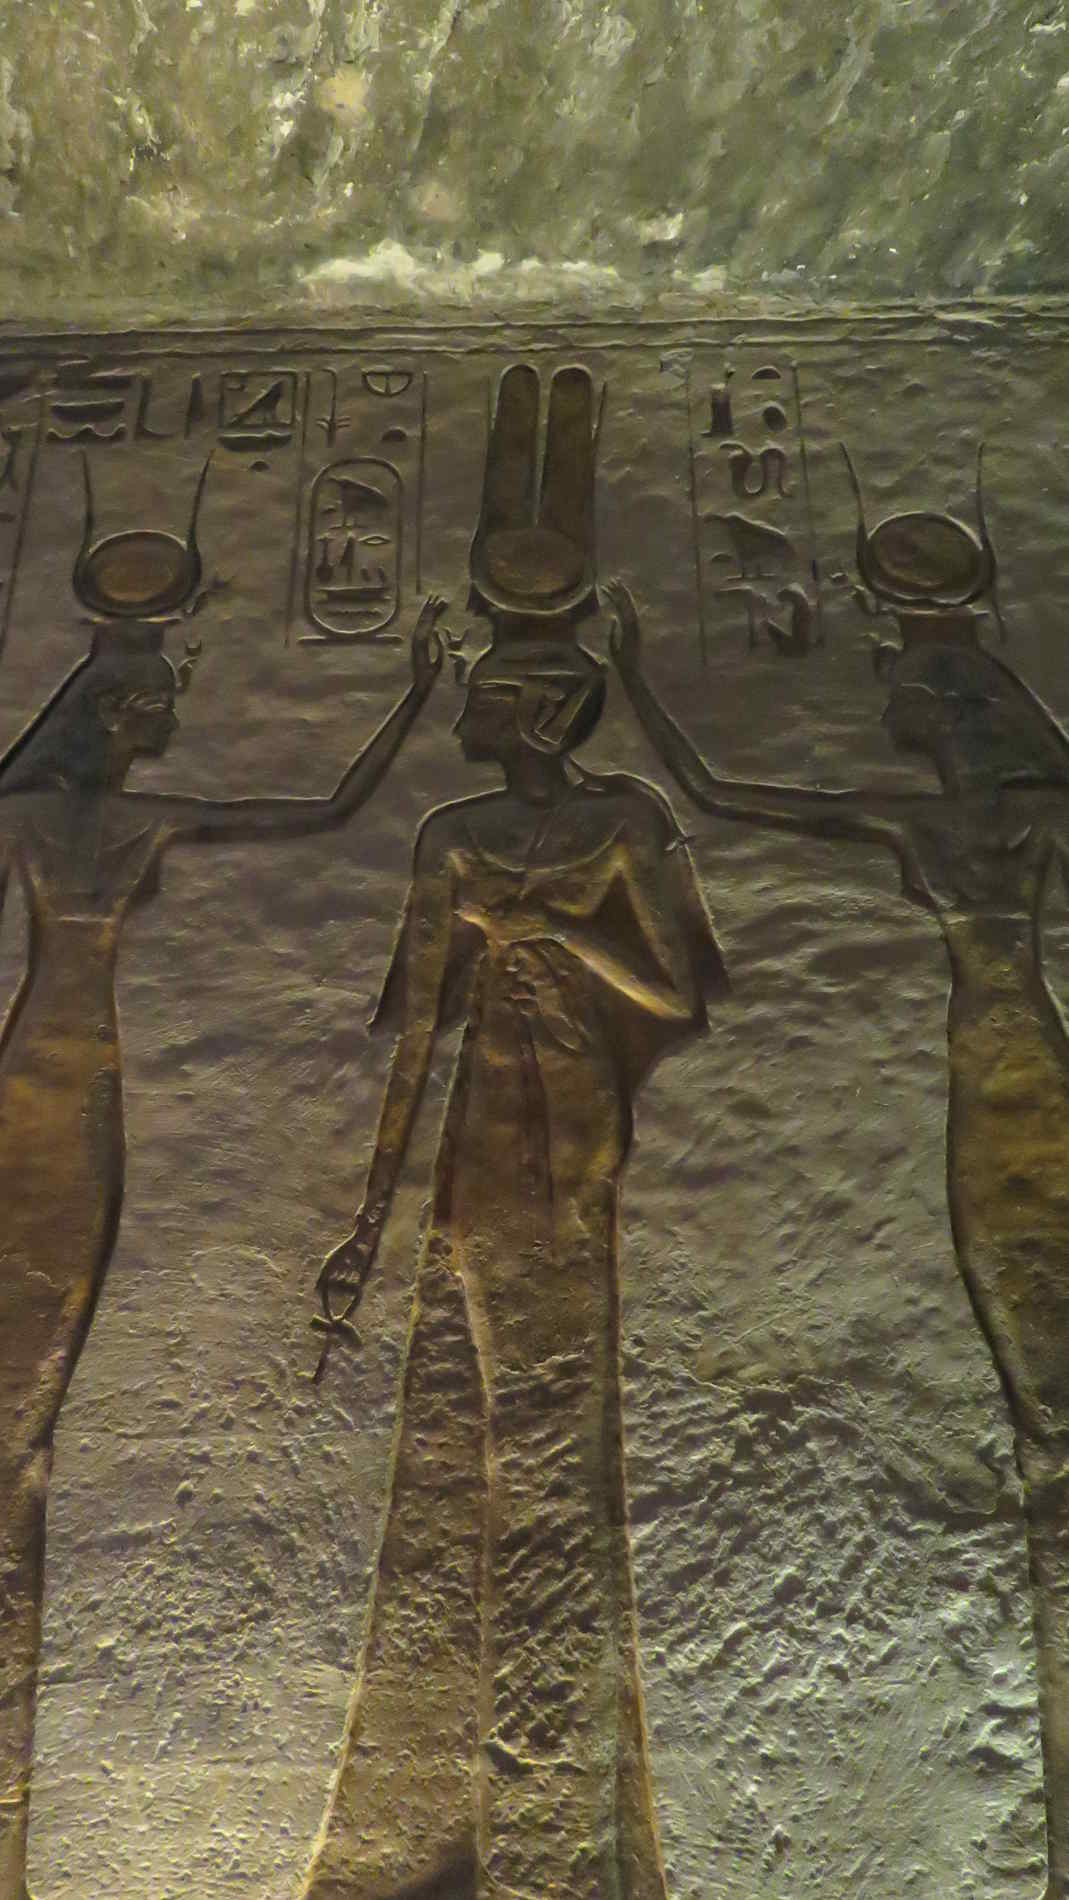 Incoronazione della Regina Nefertati Abu Simbel